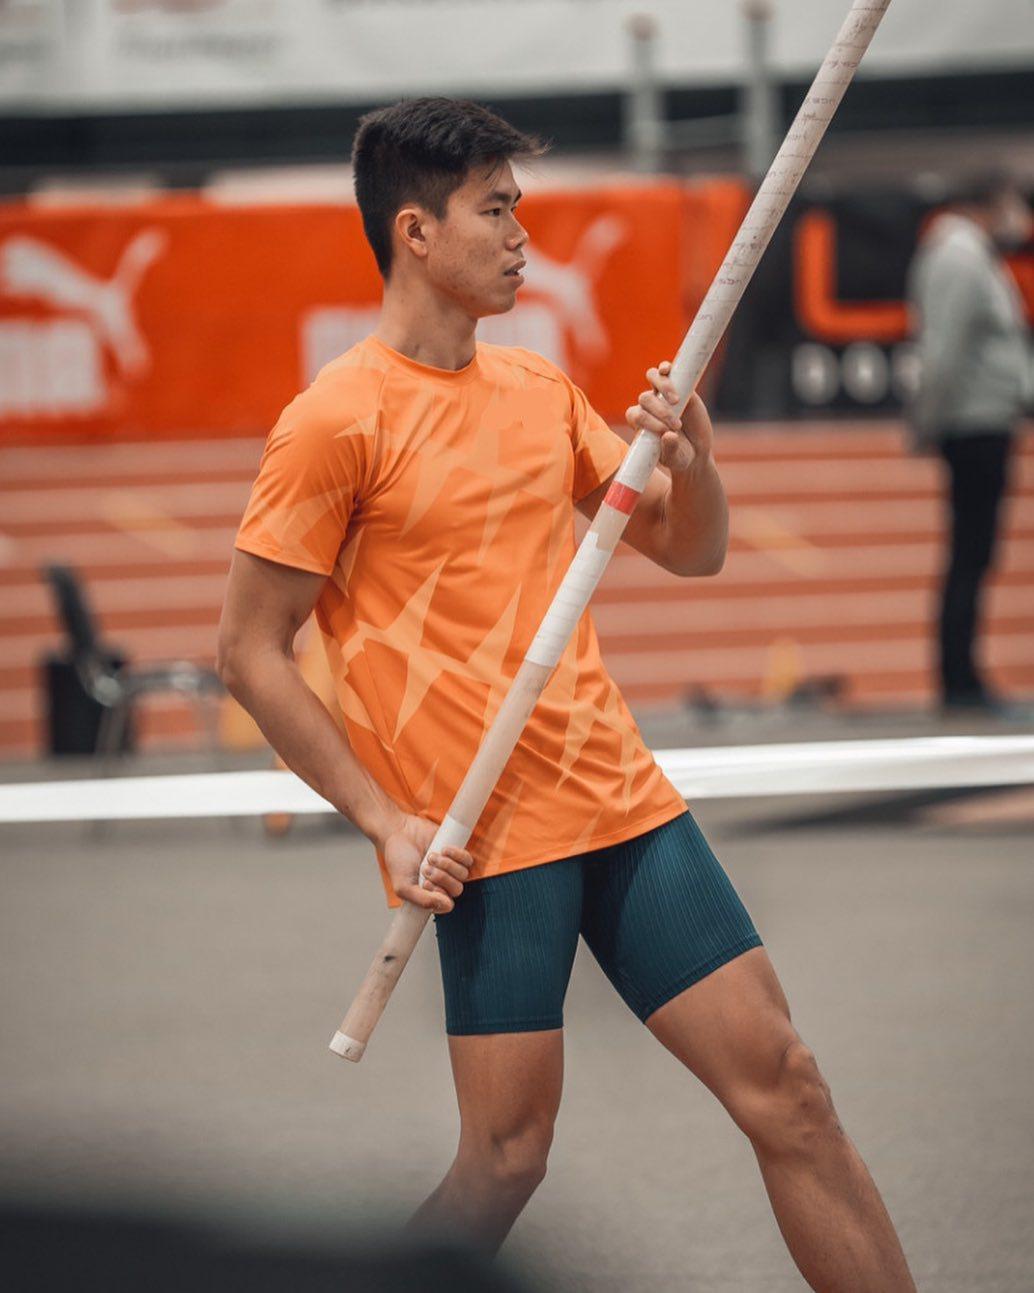 EJ Obiena pole vault gold Philippine record